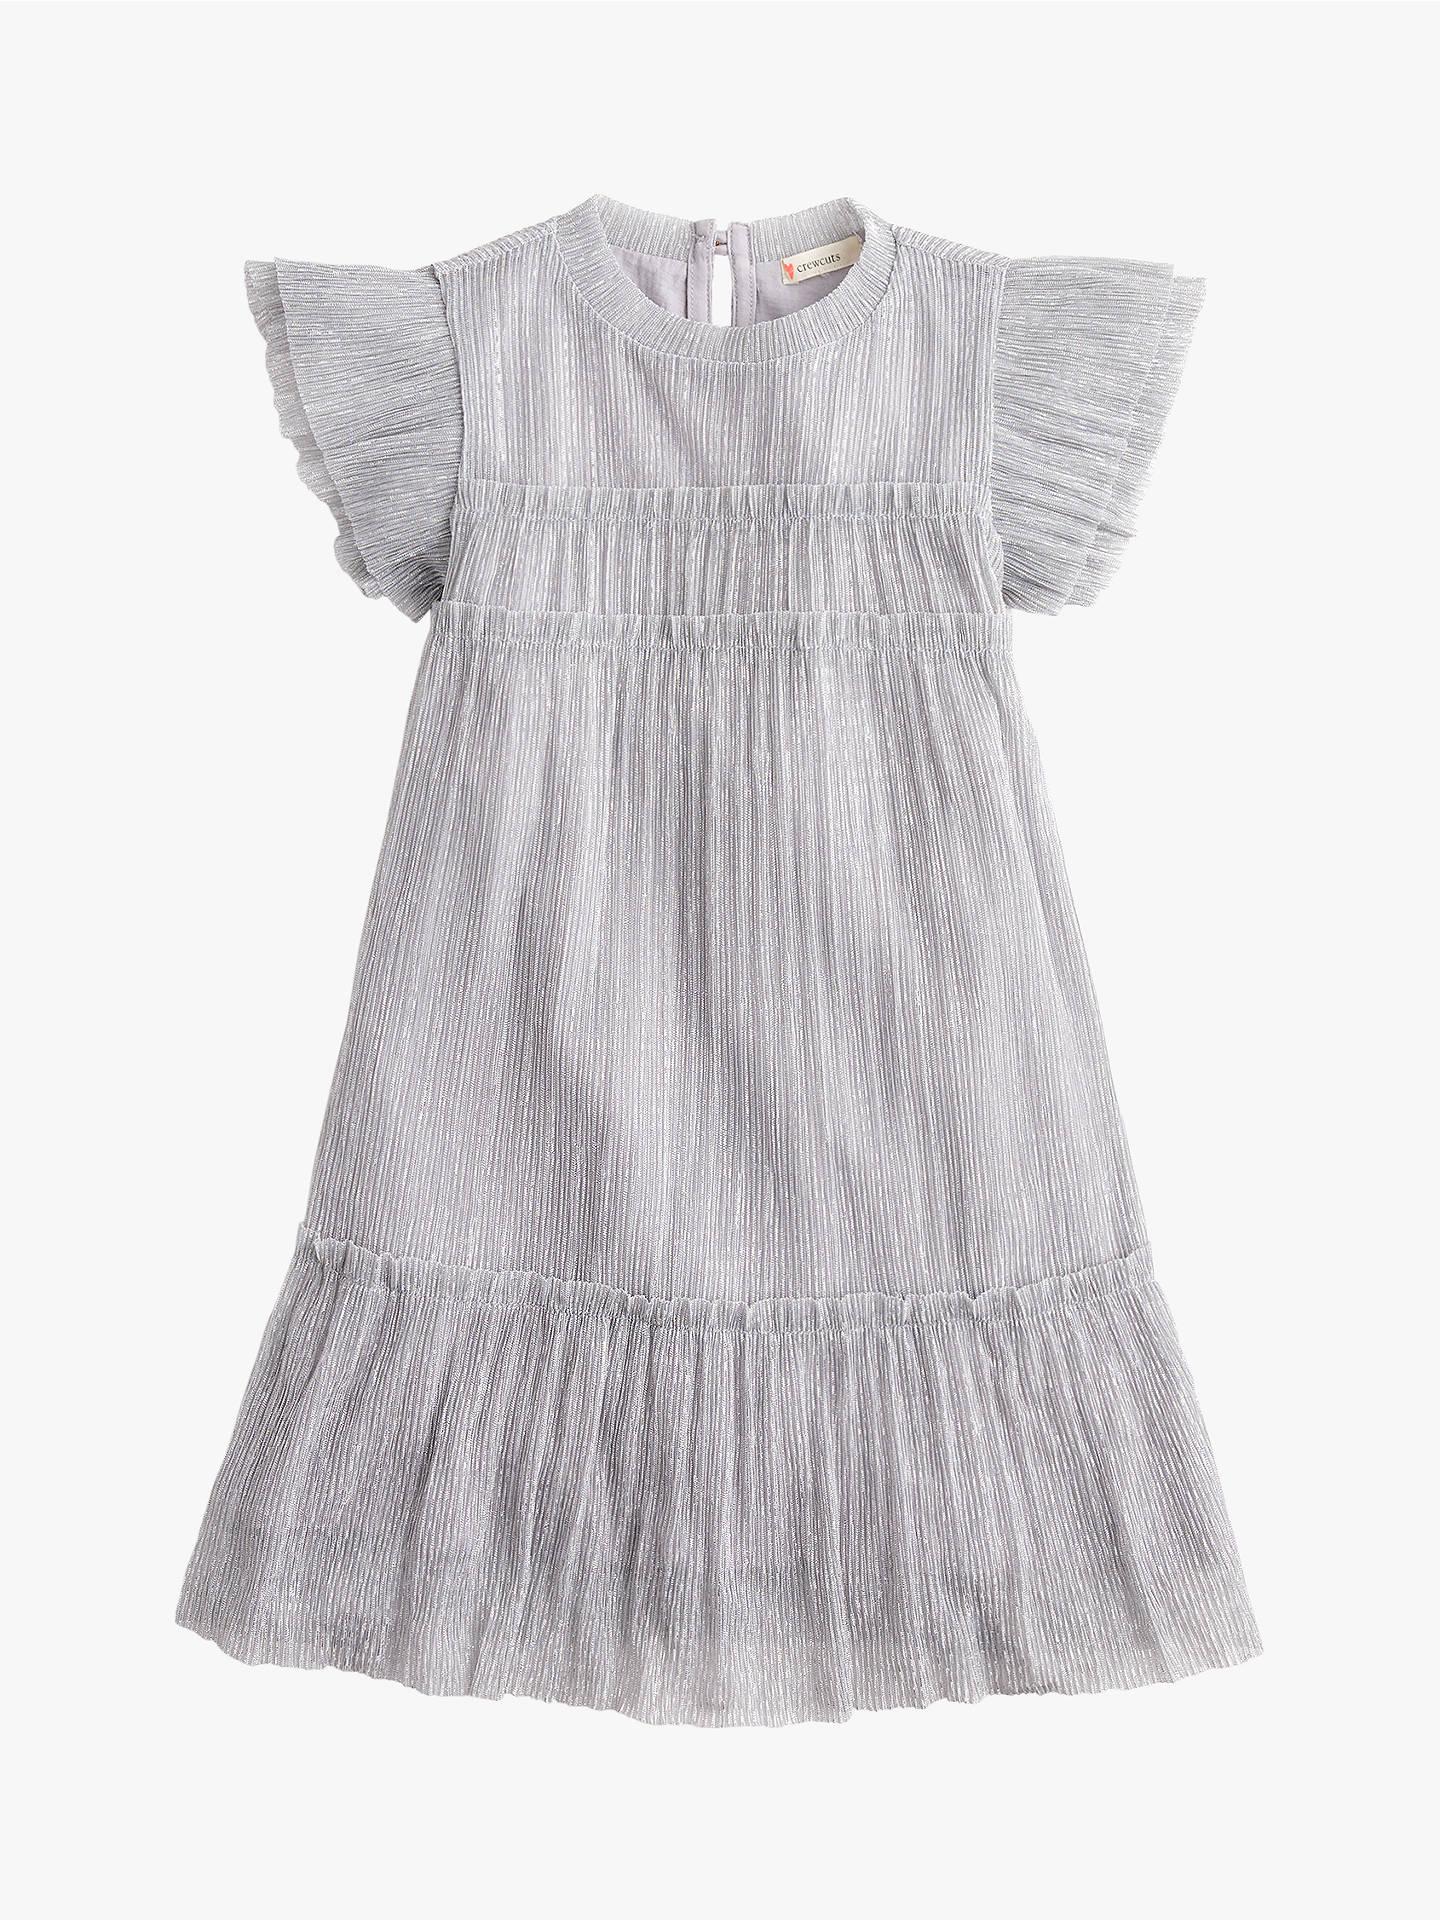 239e2498fa0 Buy crewcuts by J.Crew Girls  Janelle Metallic Pleat Dress